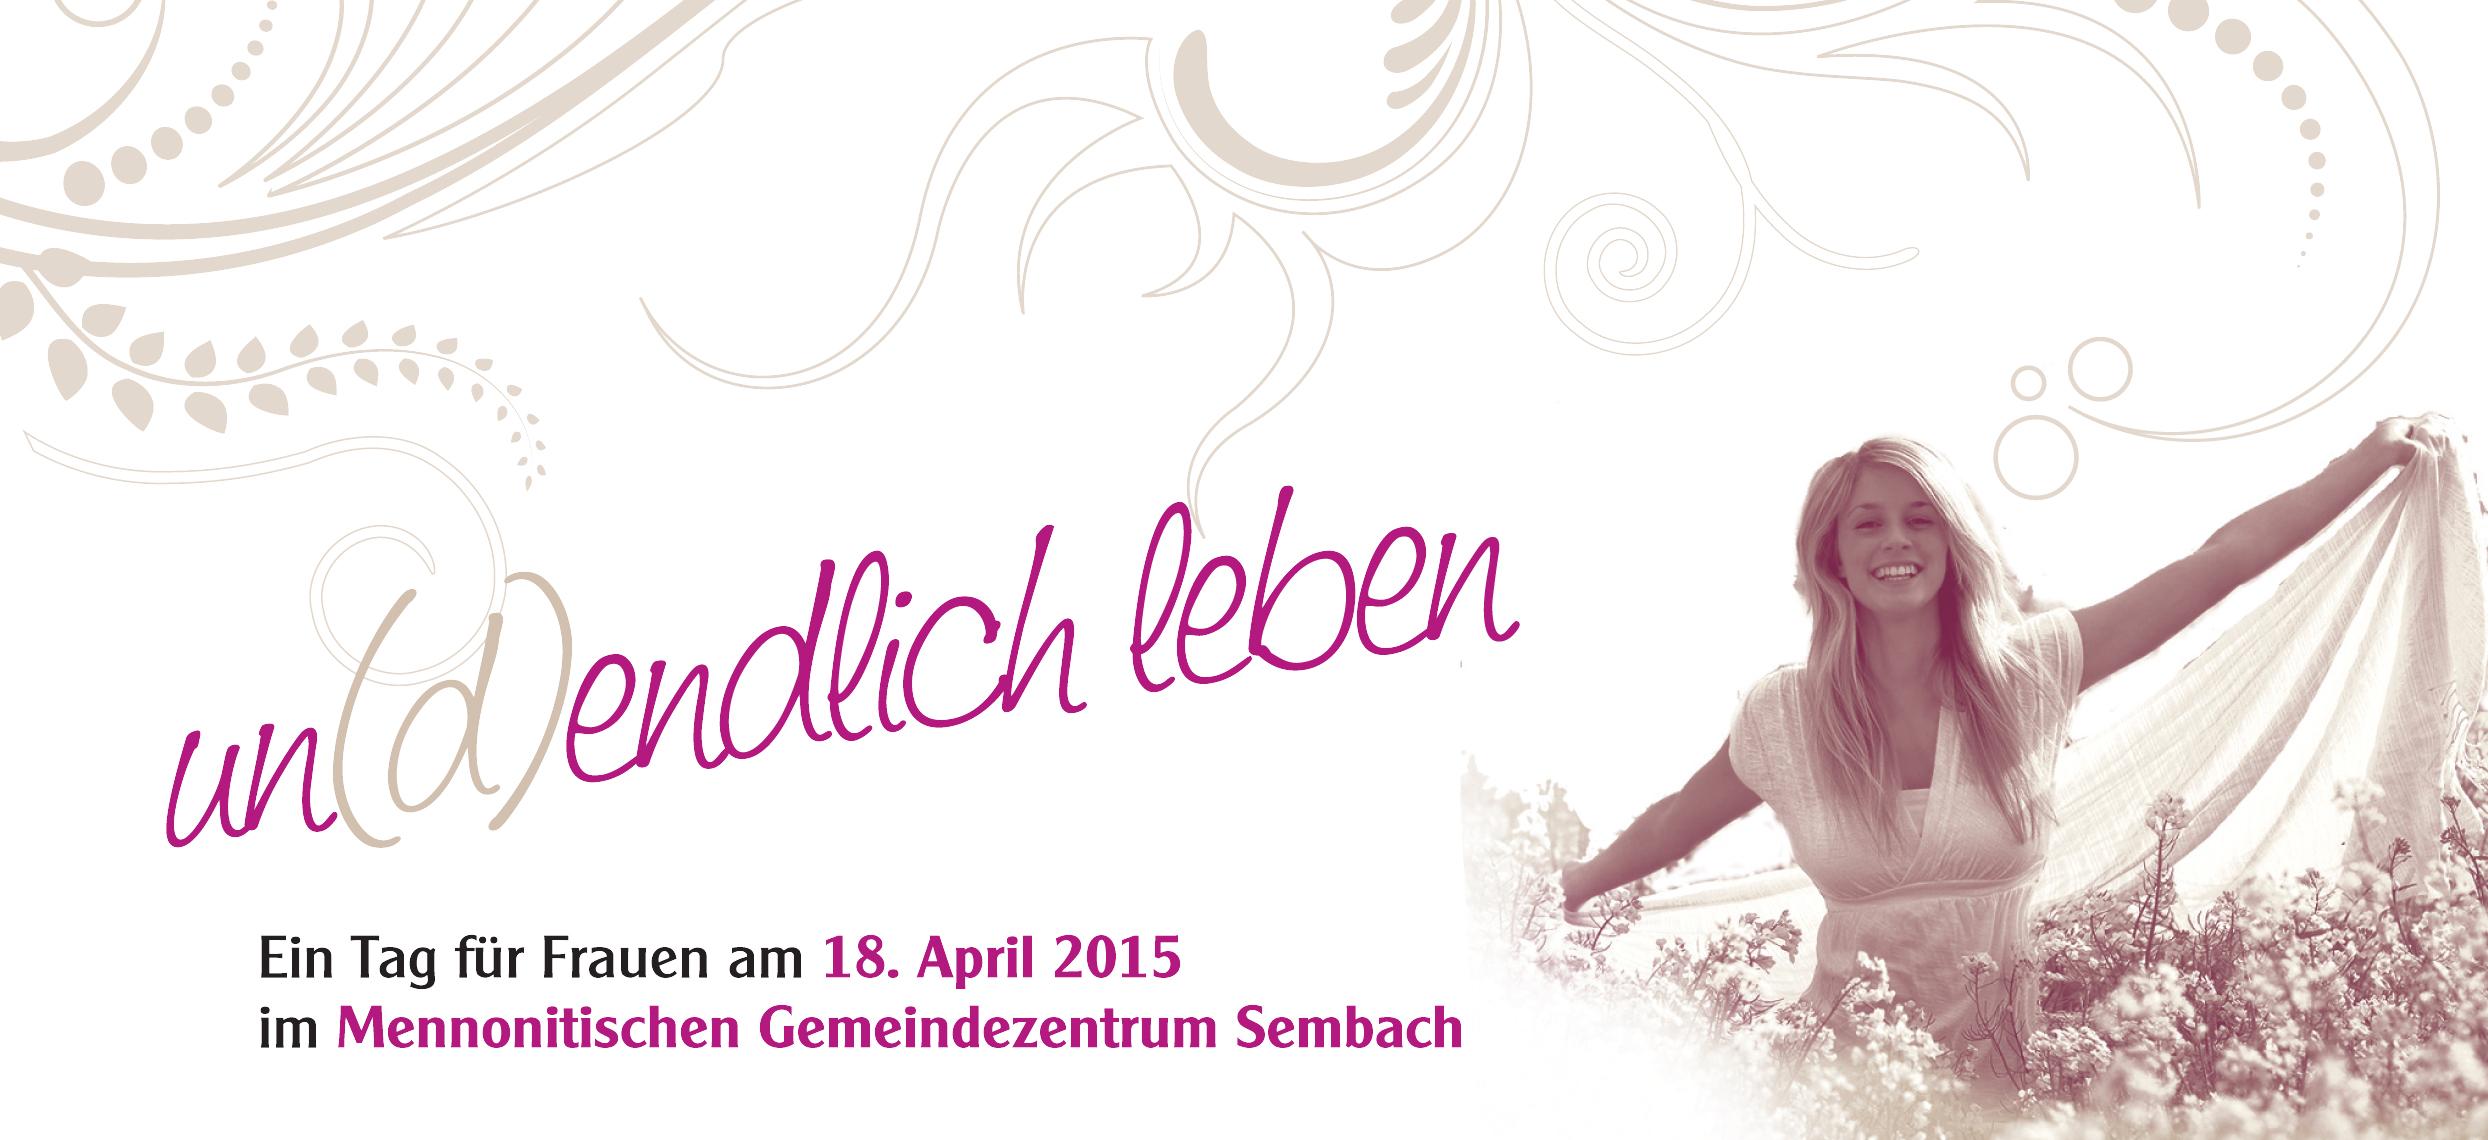 Flyer_Frauentag_2015_150102.indd